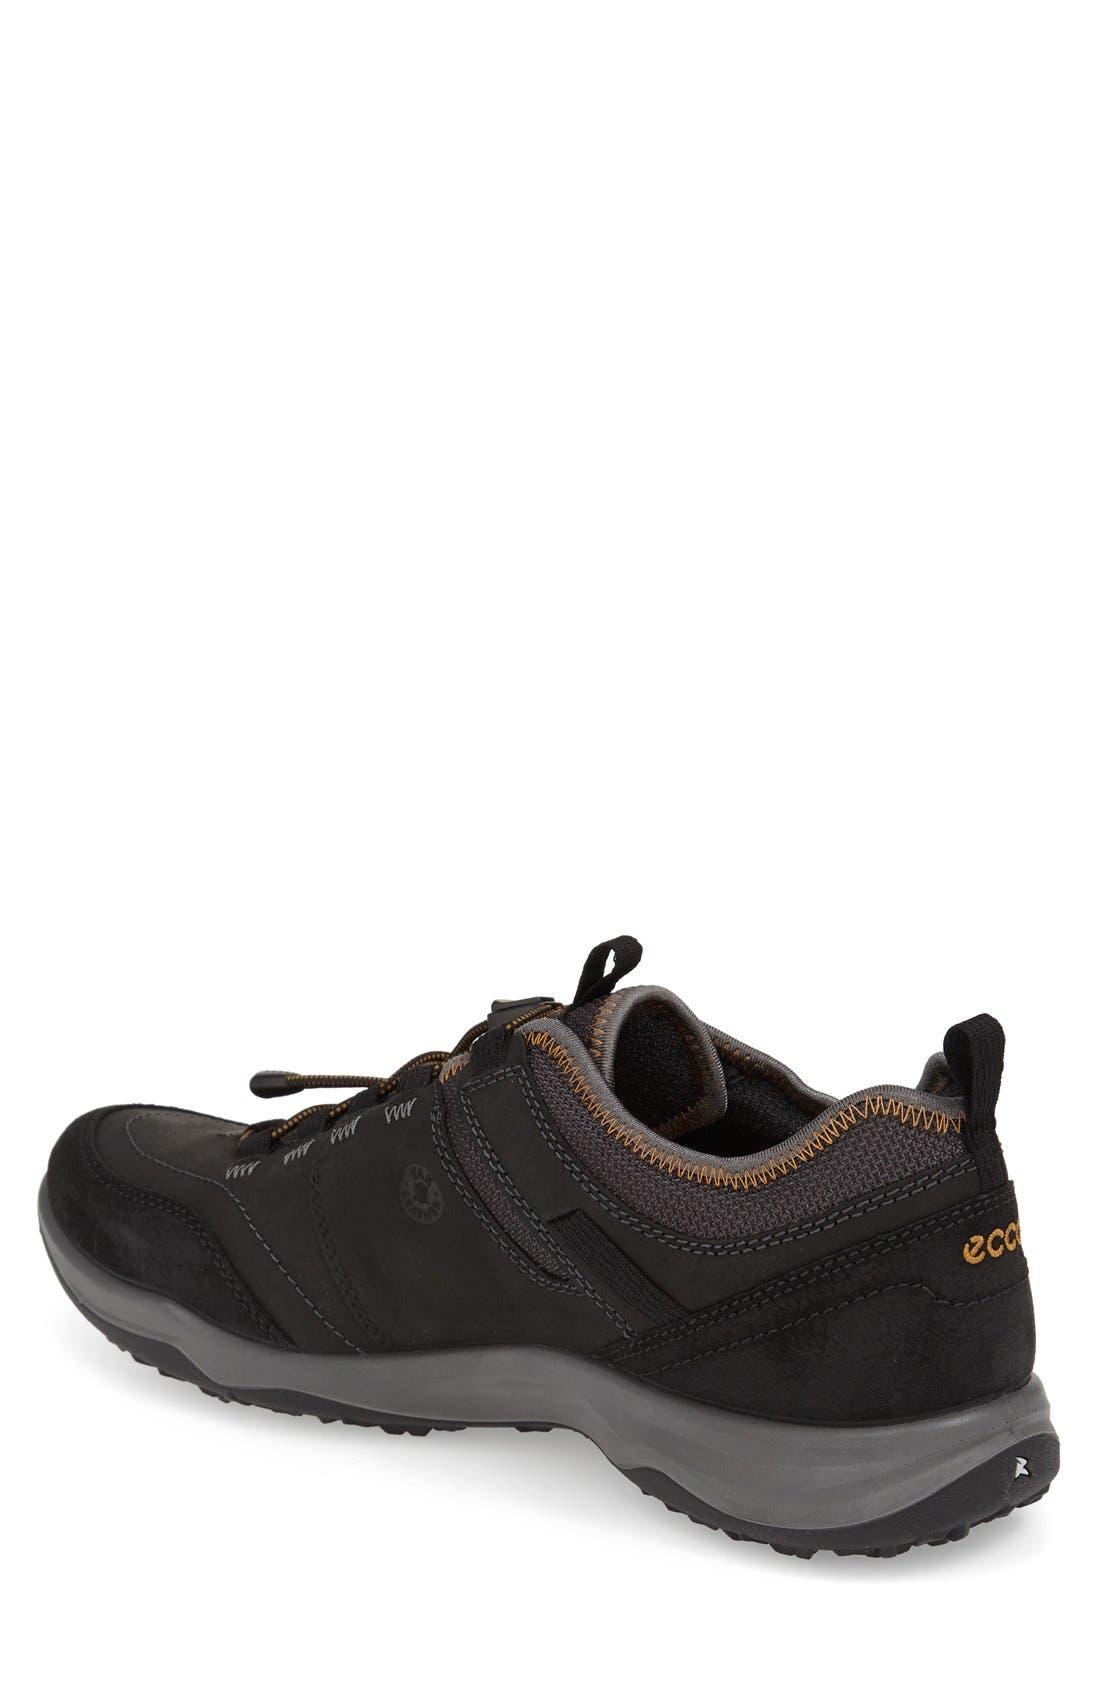 'Espinho GTX' Sneaker,                             Alternate thumbnail 2, color,                             BLACK LEATHER